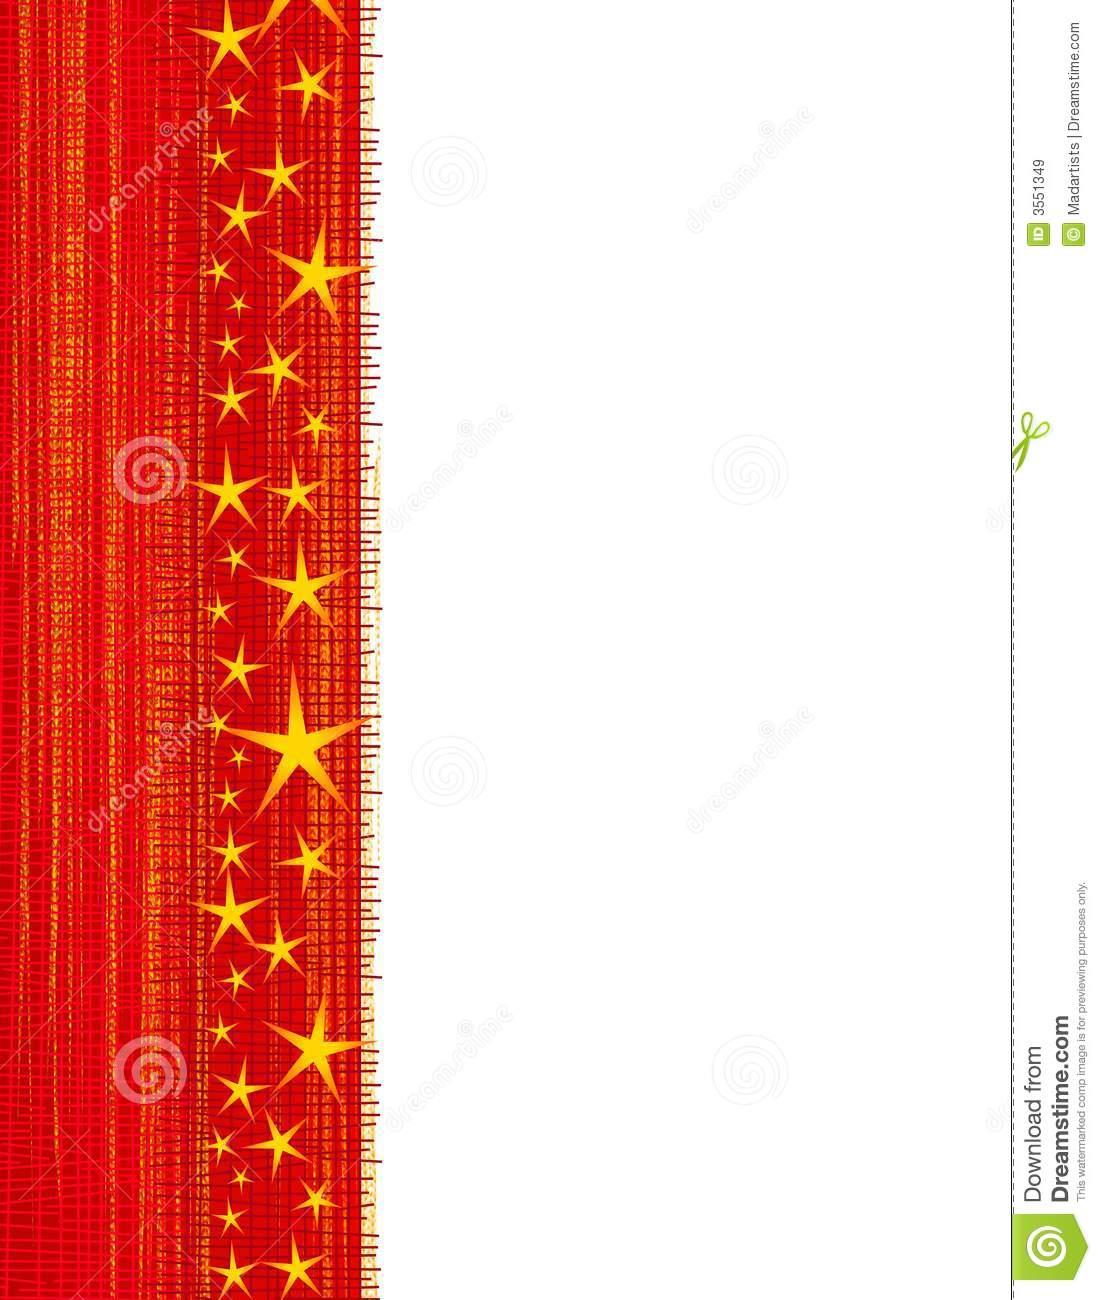 Christmas Stars Border | Clipart Panda - Free Clipart Images